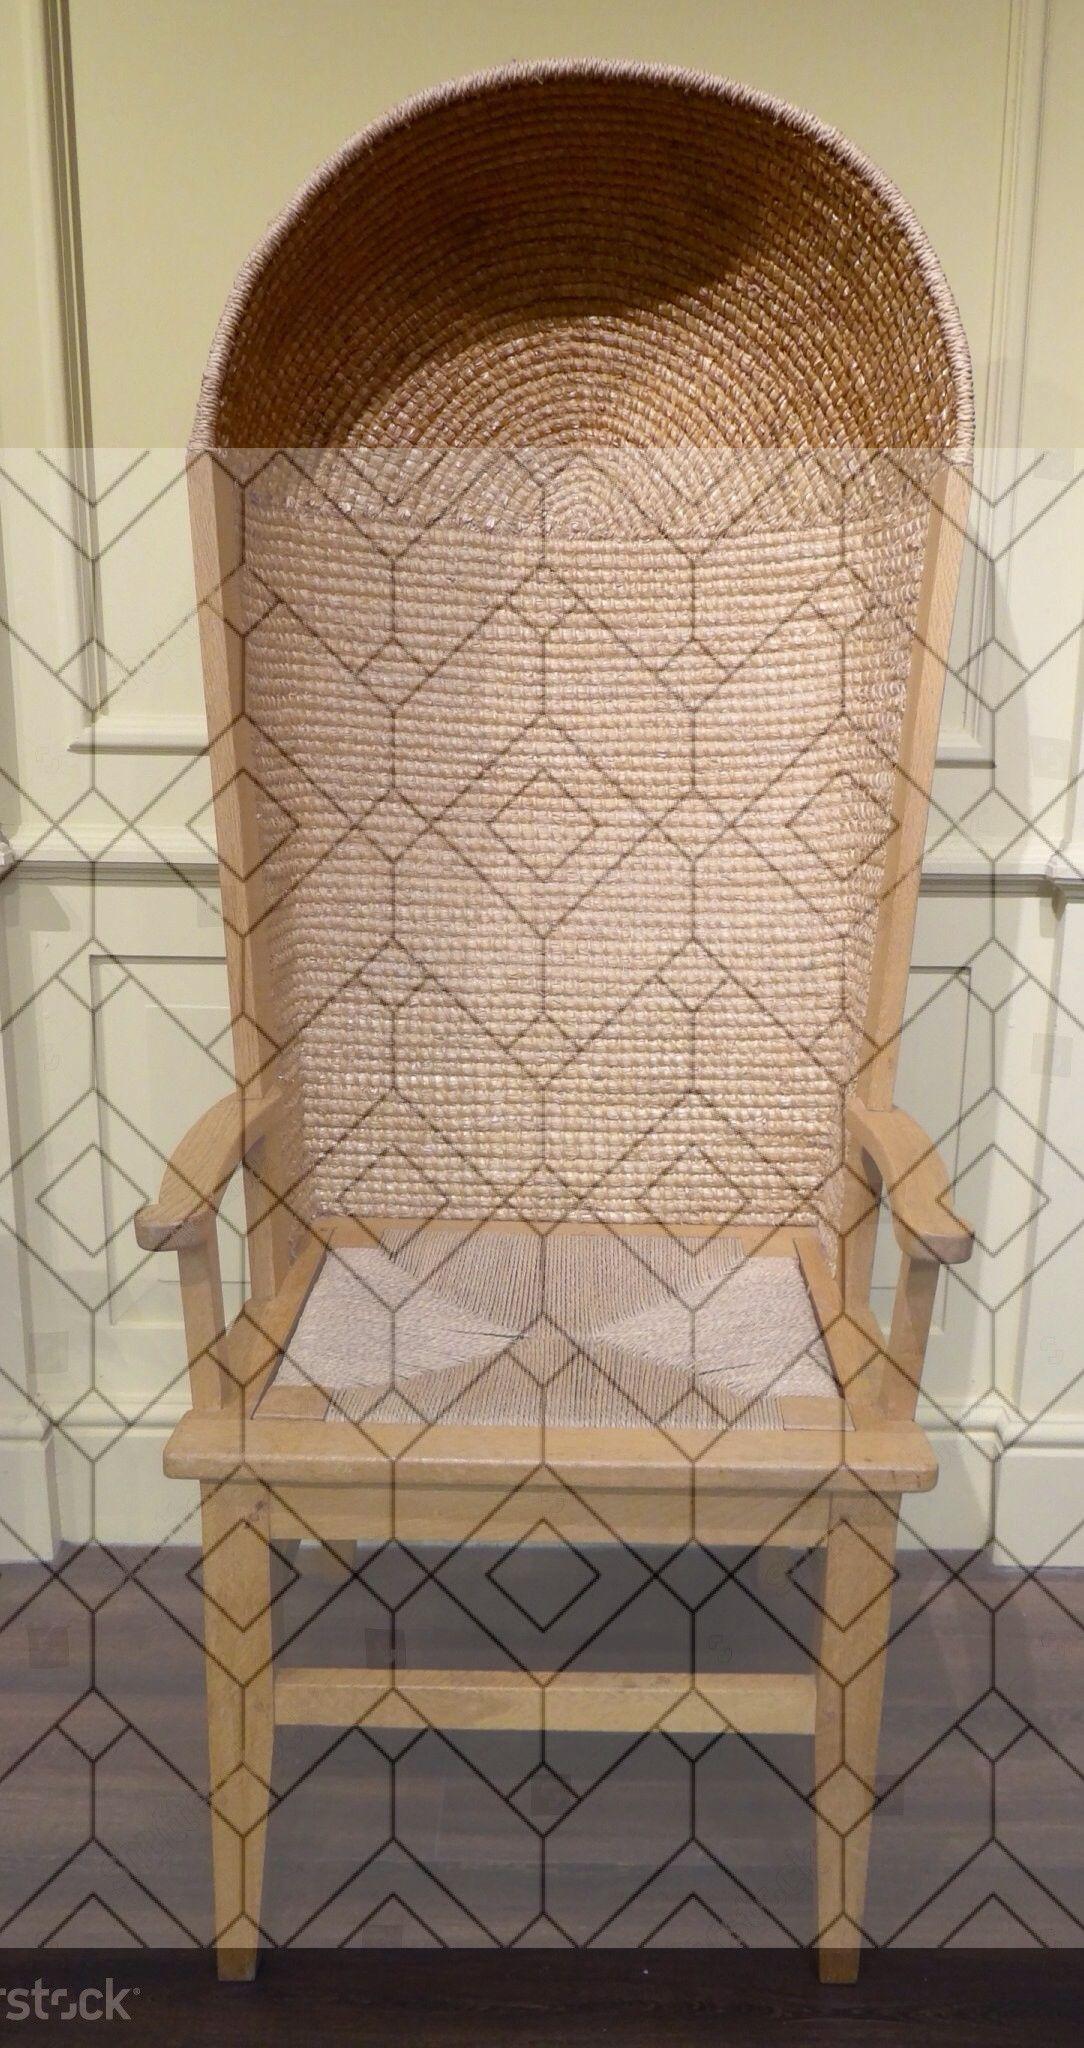 10+ Awe-Inspiring Fabric Canopy Flower Ideas | Door Canopy | Canopy